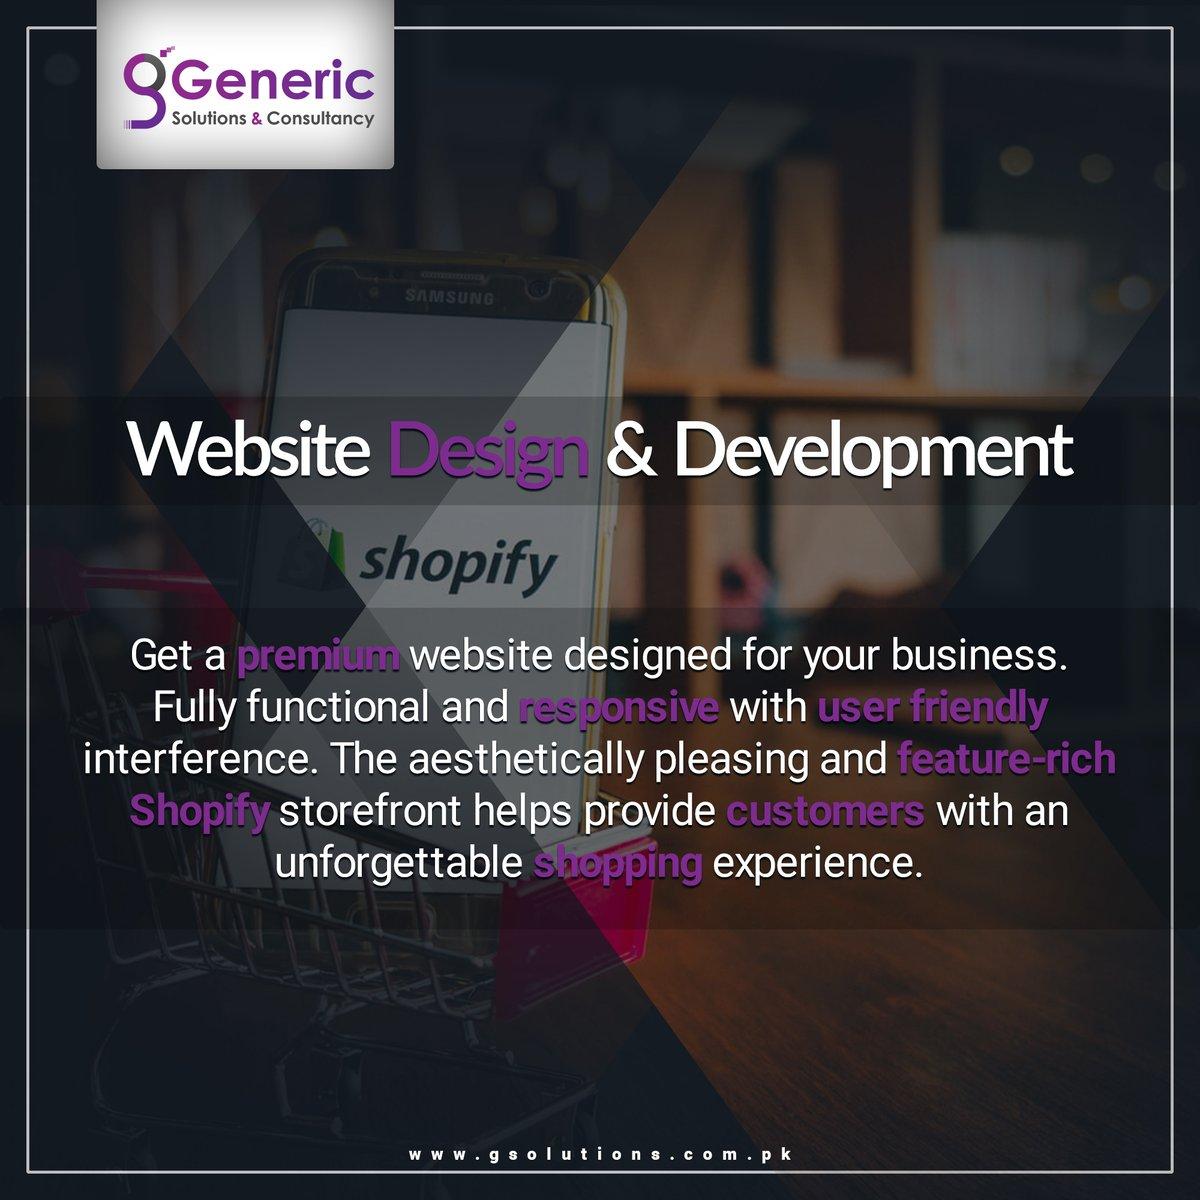 Get it designed exactly your way!  We are just one click away!   #ecommerce #webdevelopment #design #branding #marketing #brand #logo #webdesigningservices #generics #gsc21 #ecommercewebdesign